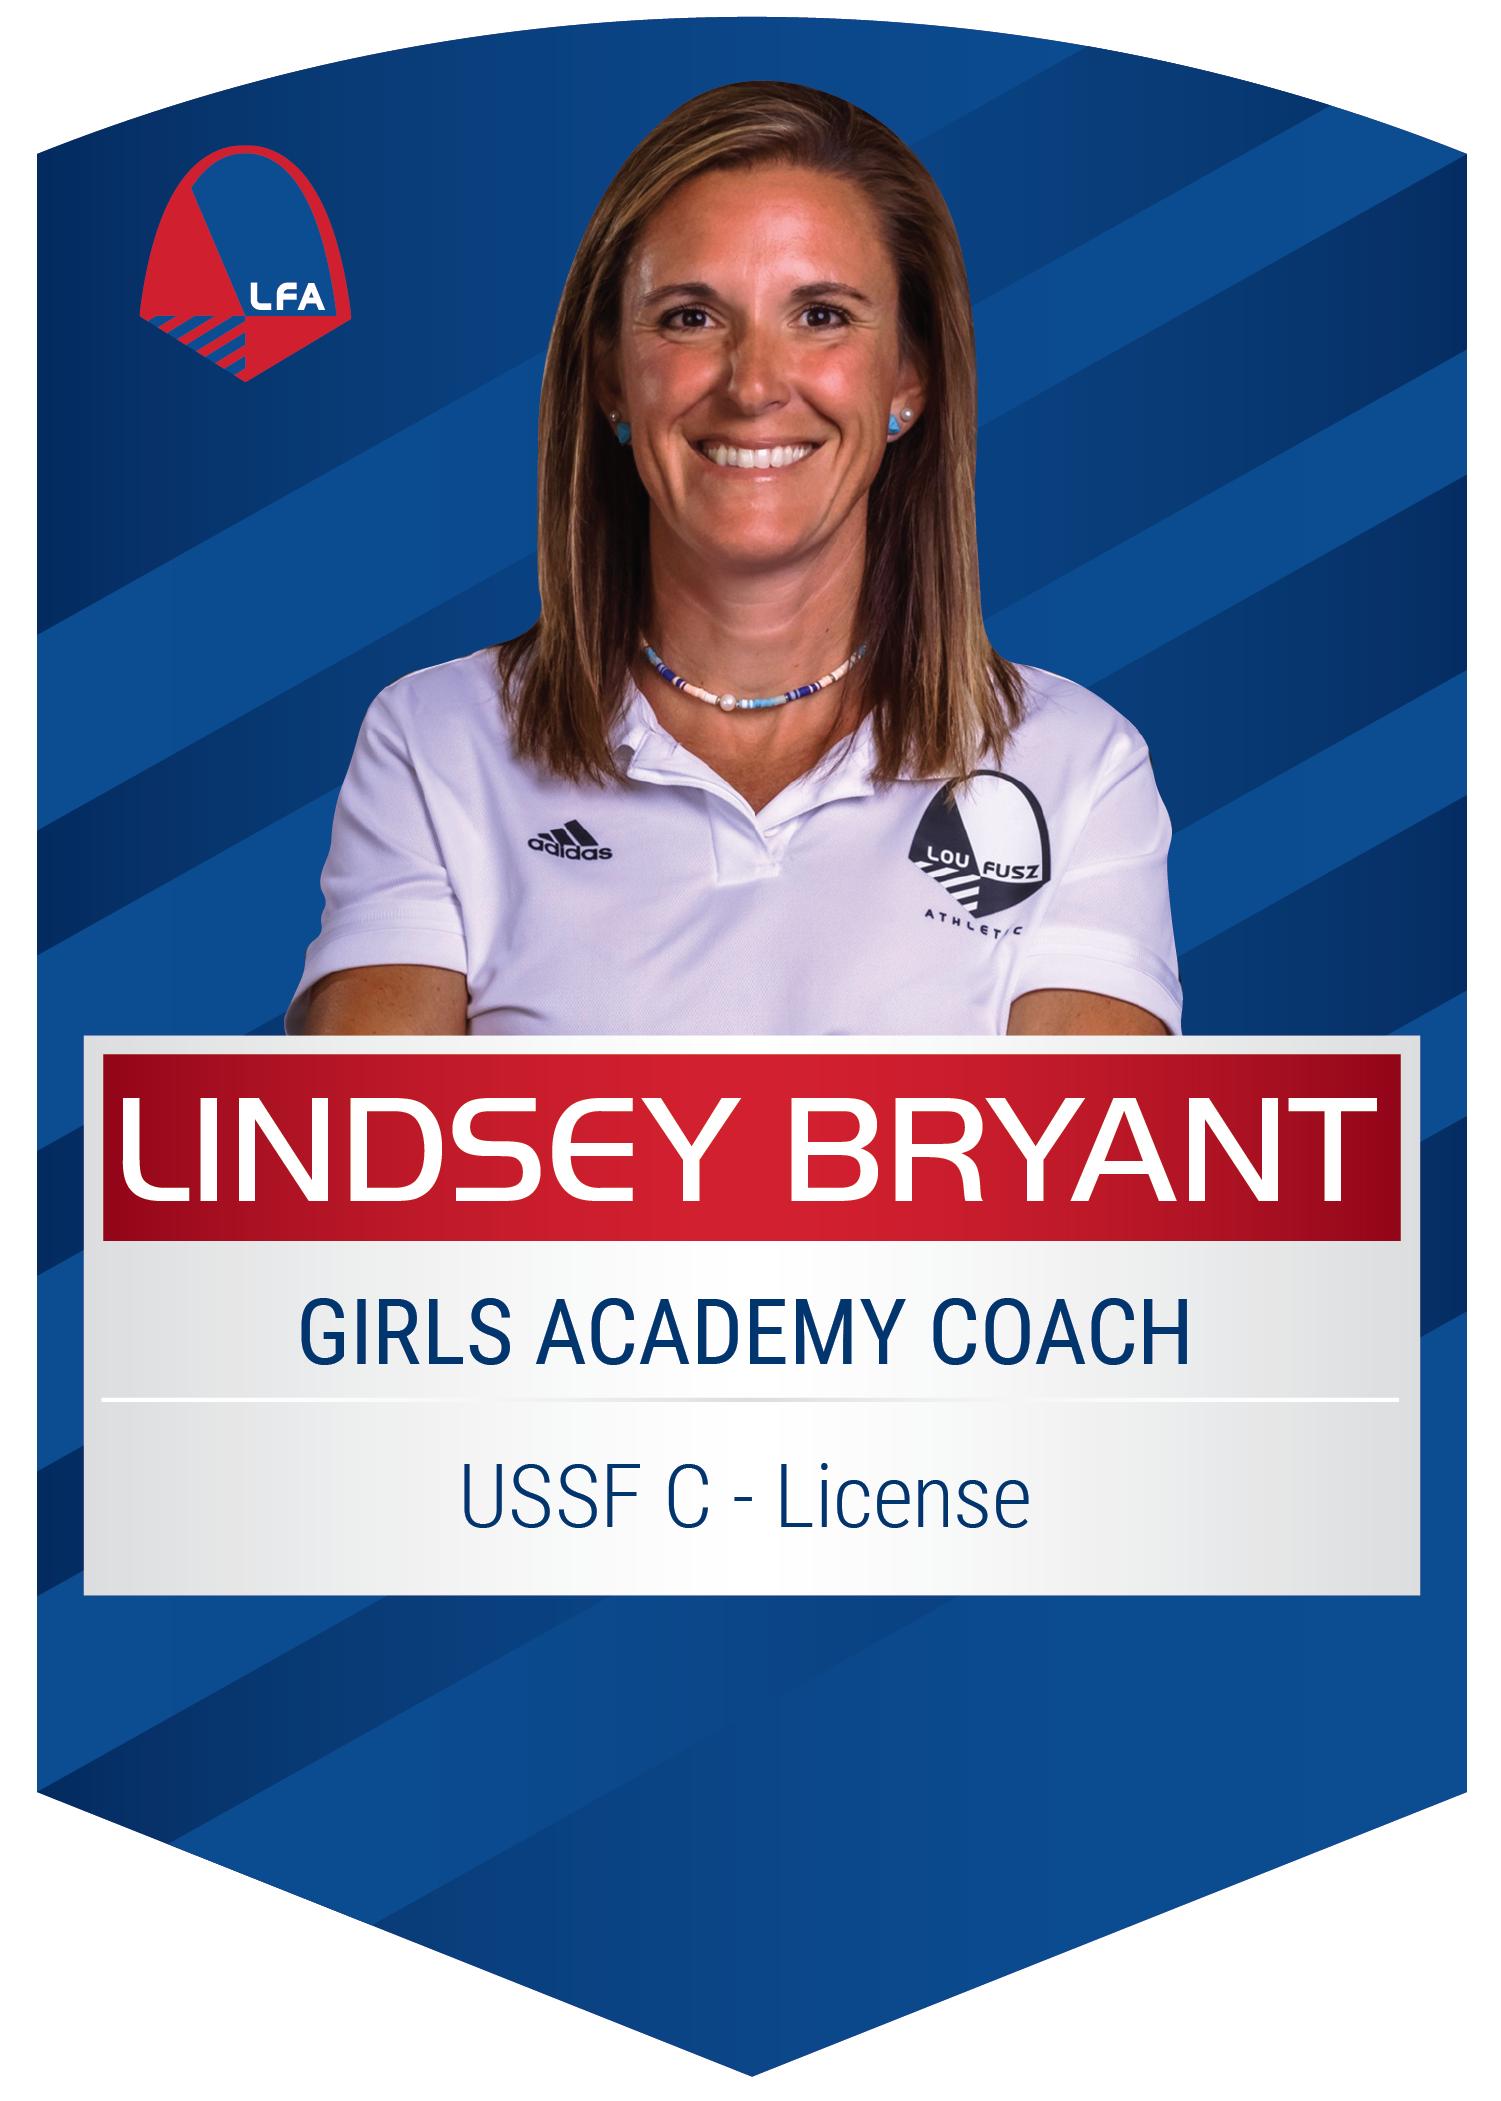 Lindsey Bryant